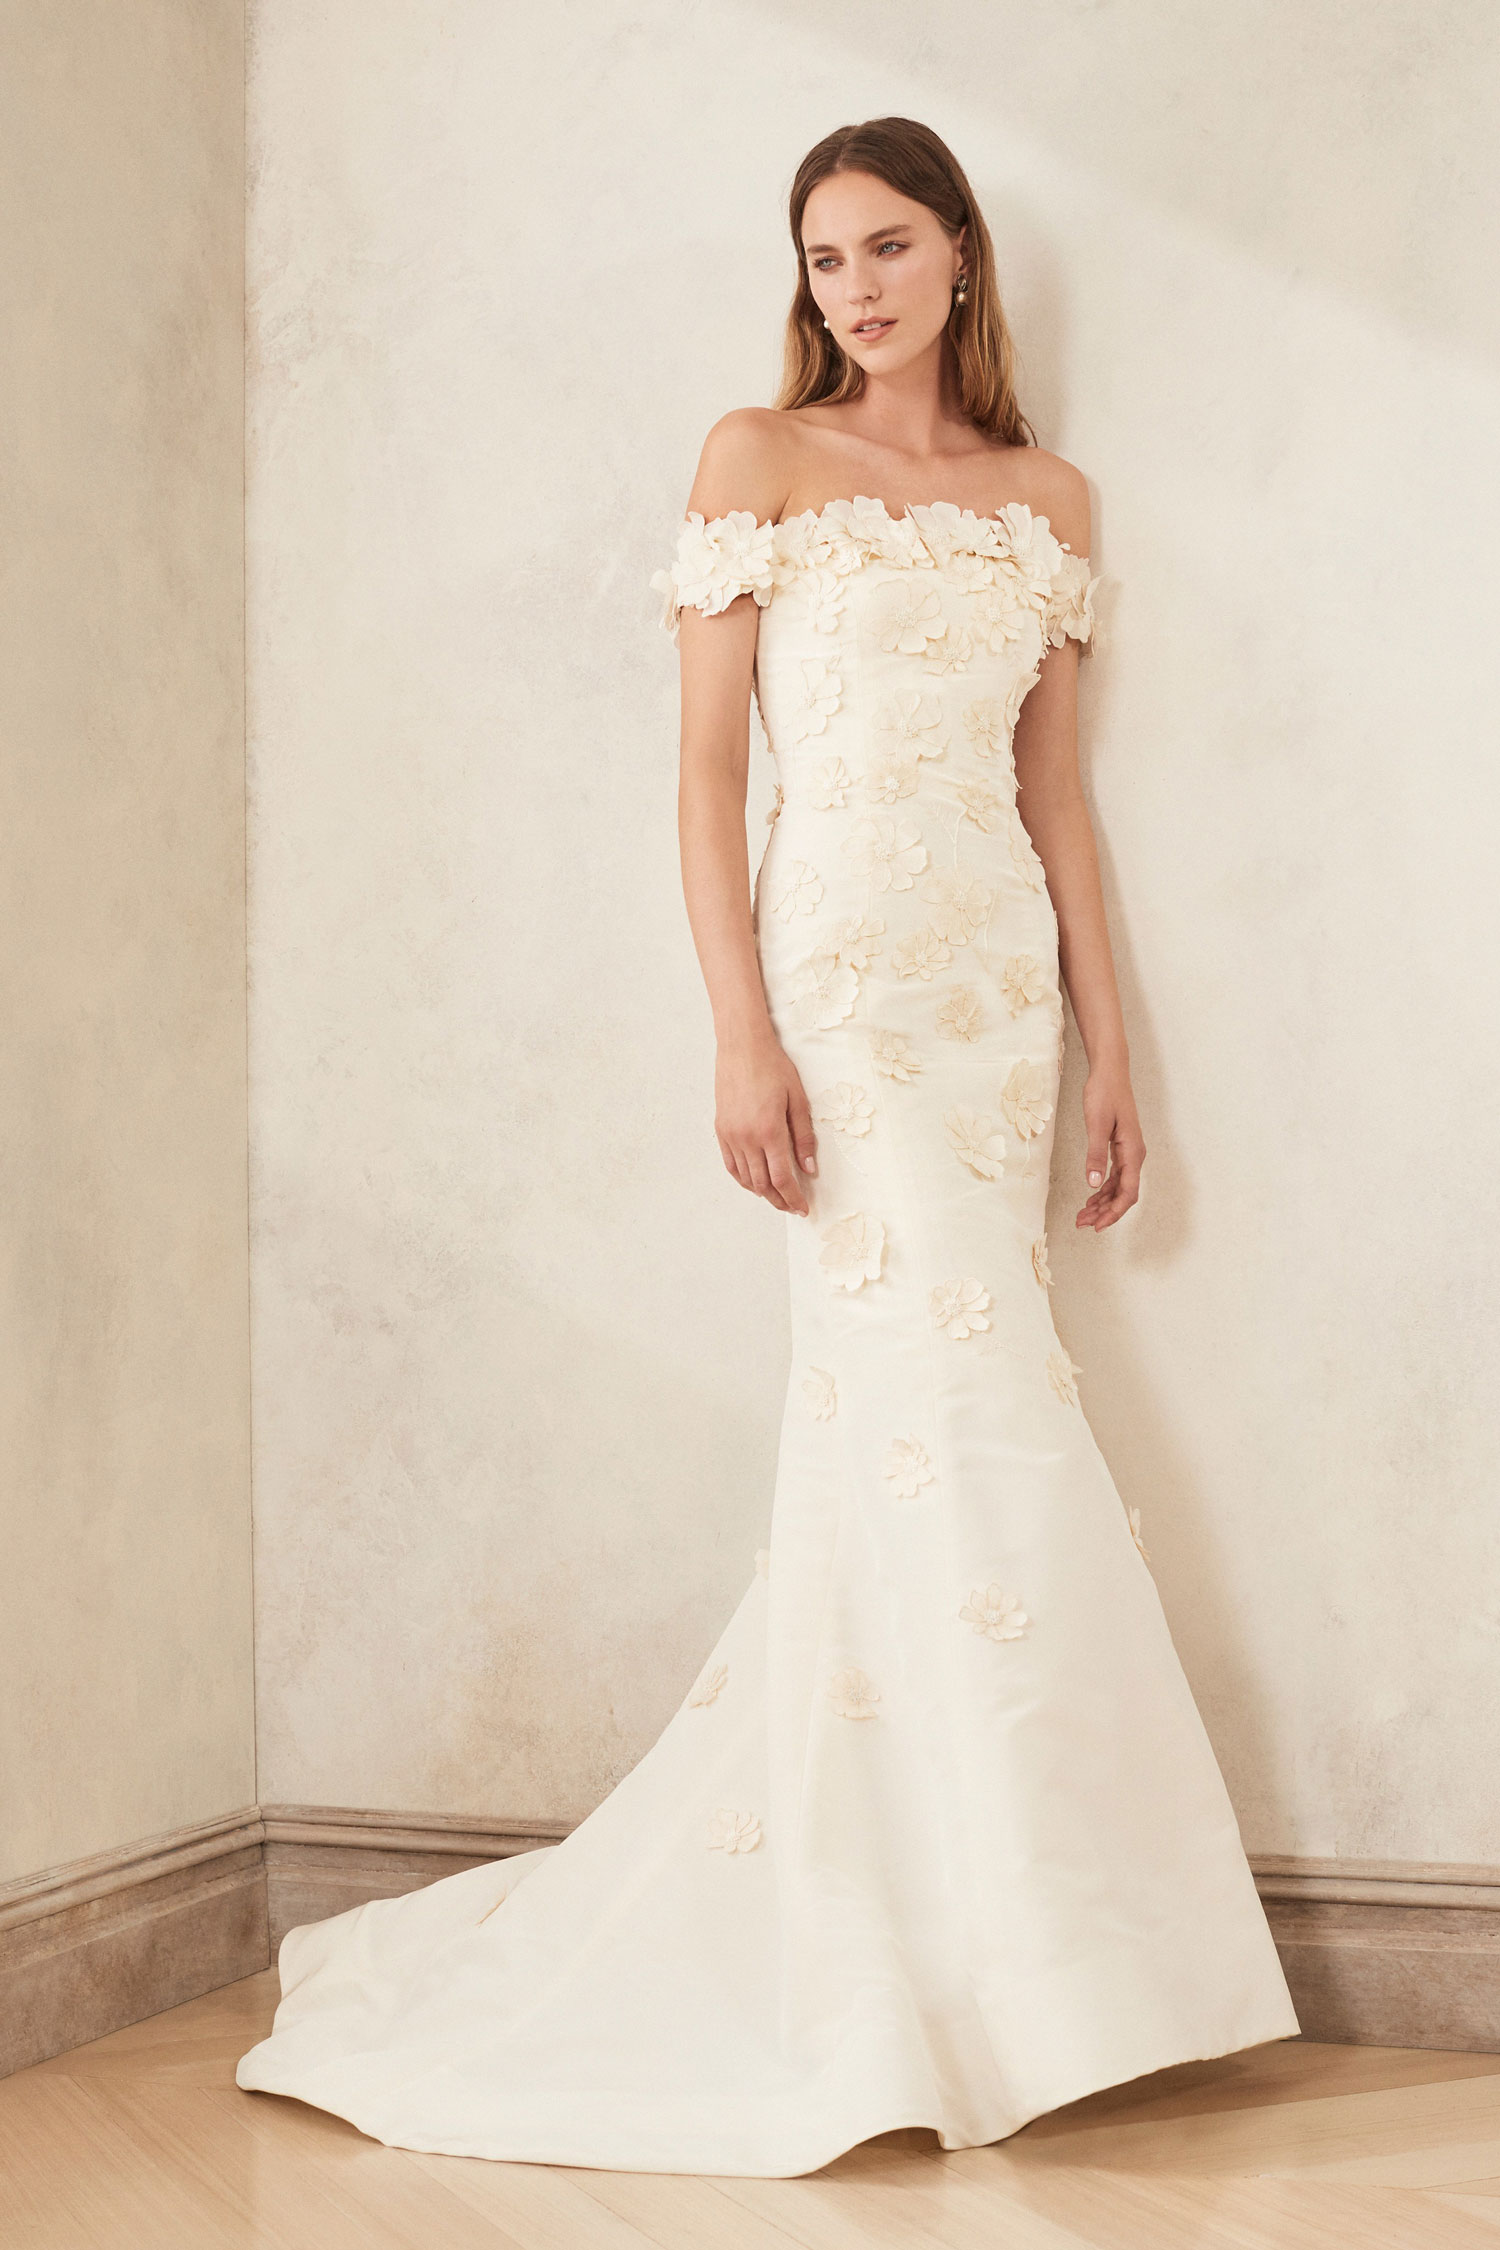 Oscar de la Renta fall 2020 off shoulder flower applique wedding dress ideas carine's bridal atelier